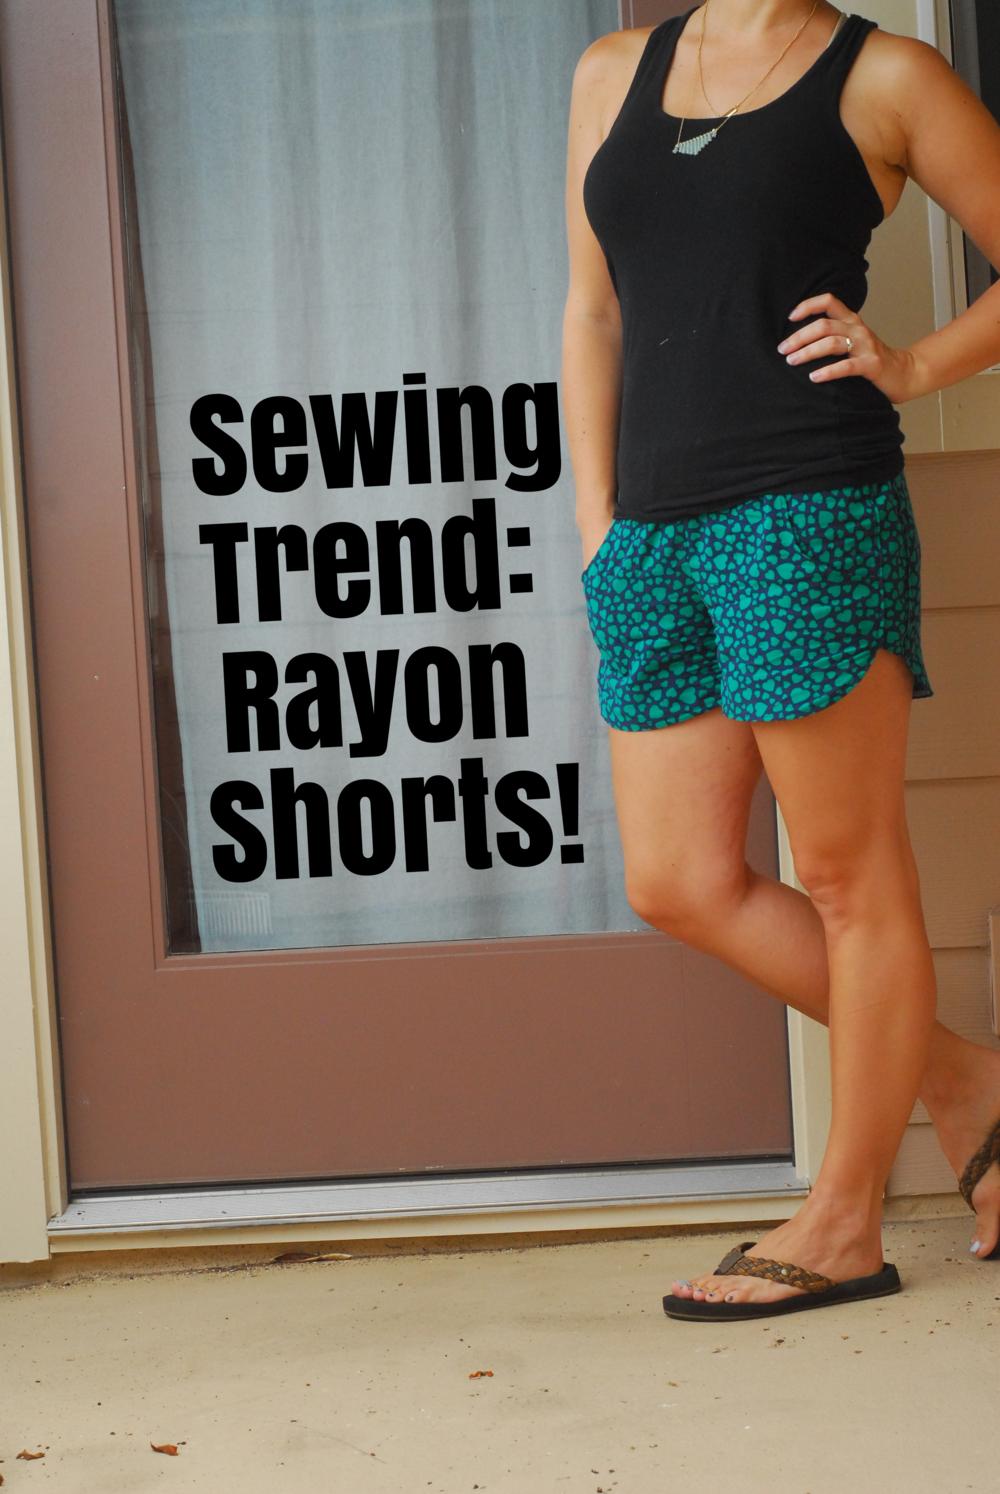 Sewing on Tread: Rayon Shorts